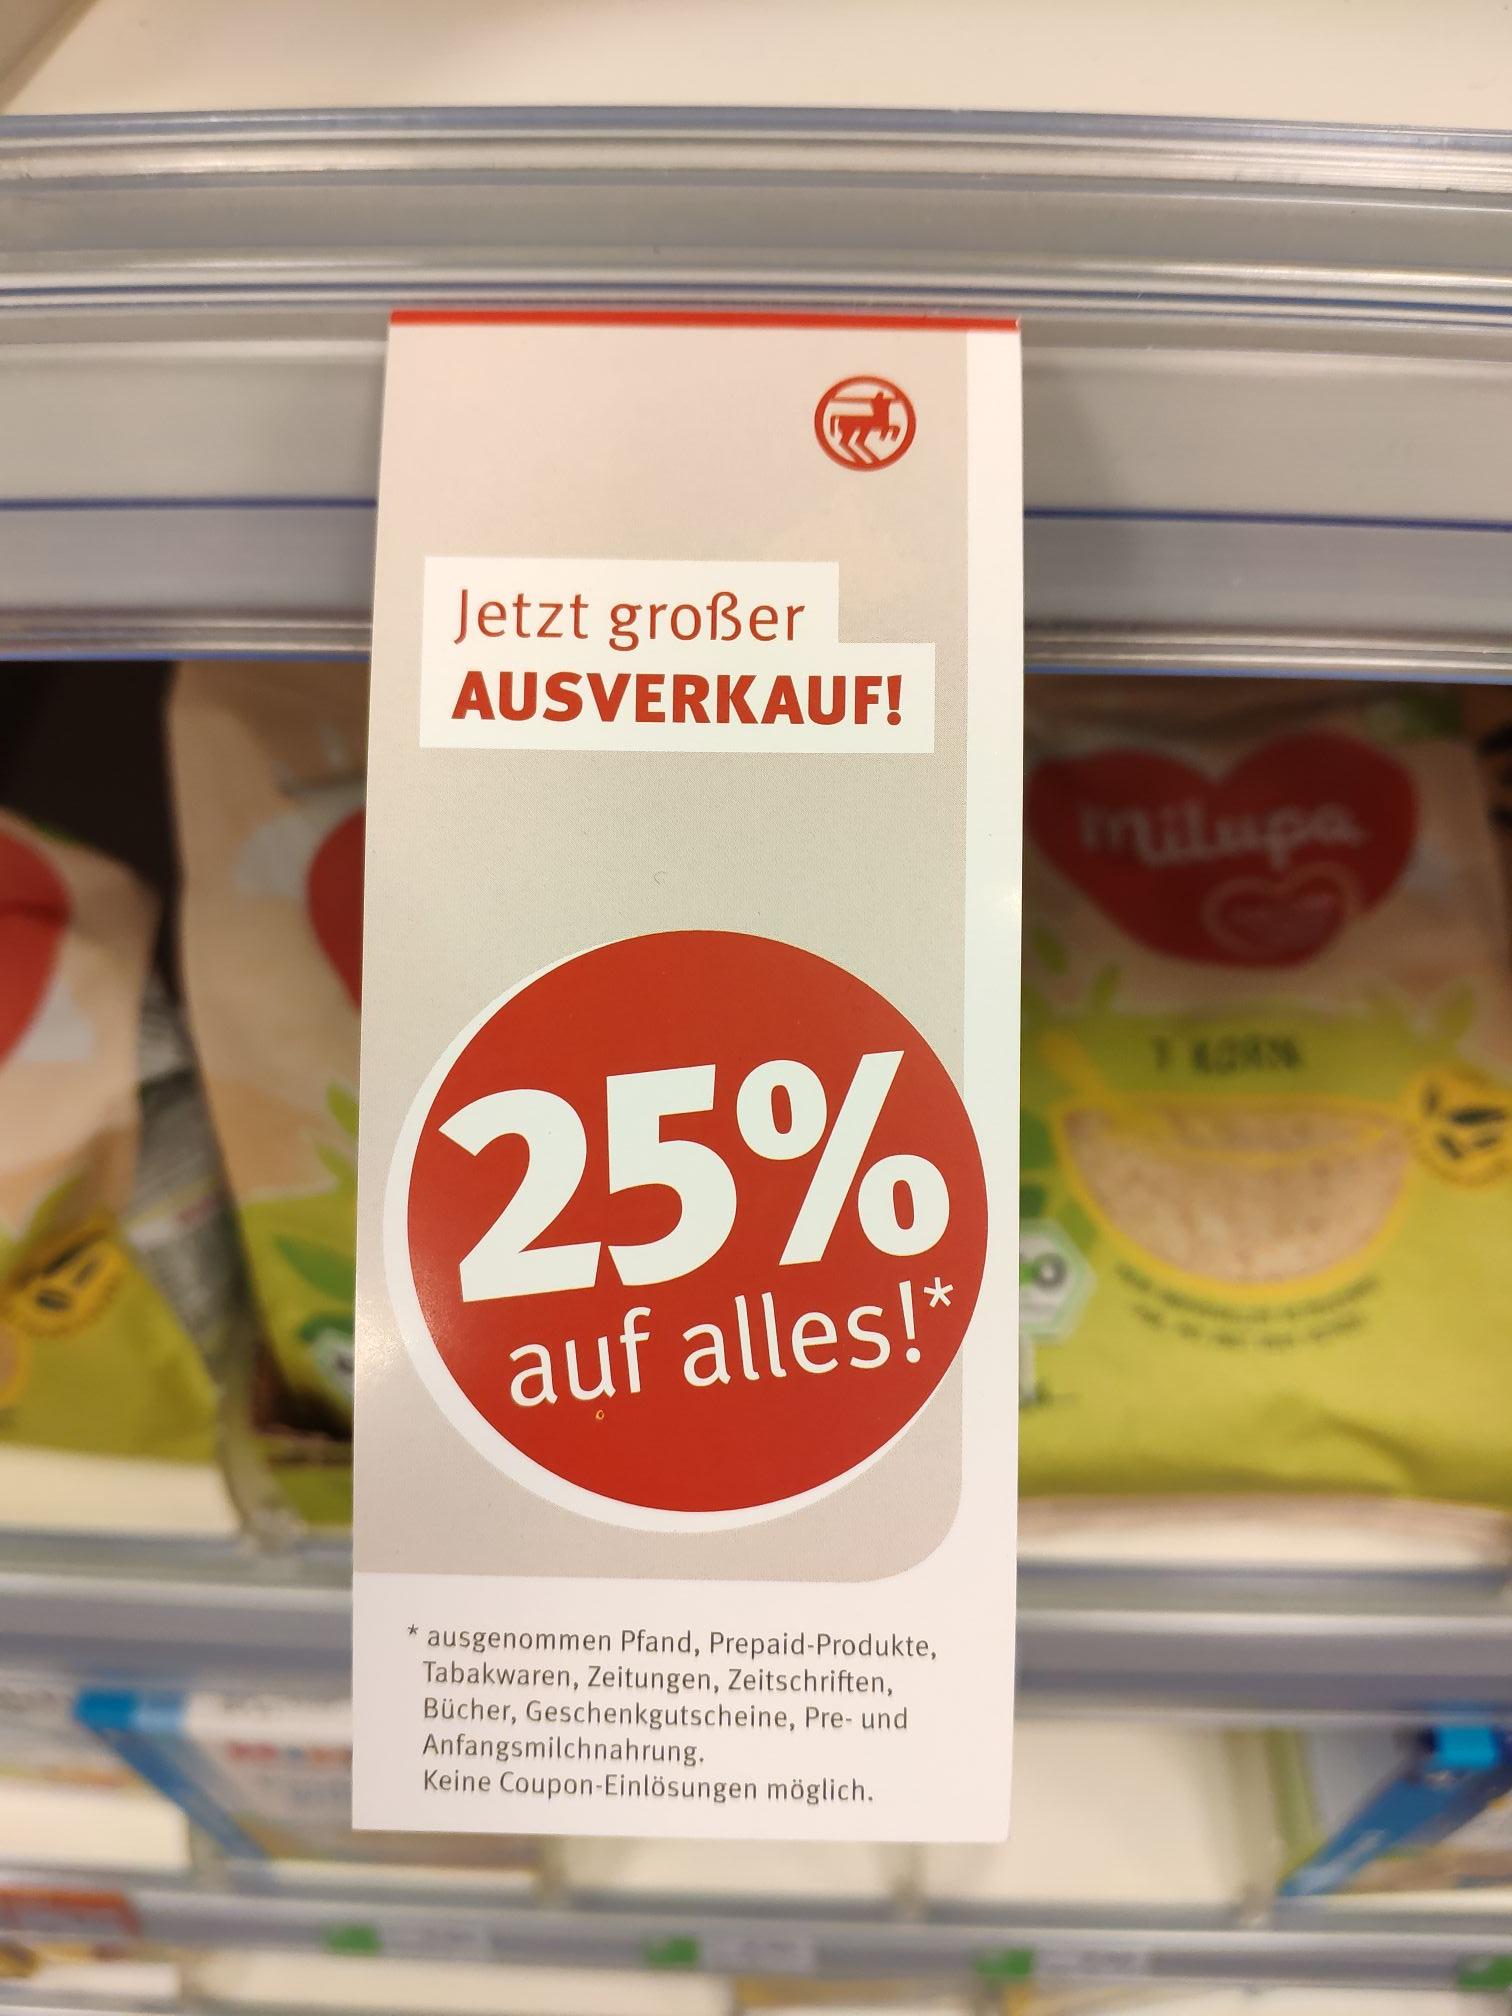 Lokal - Rossmann Gifhorn - Ausverkauf - 25% auf alles